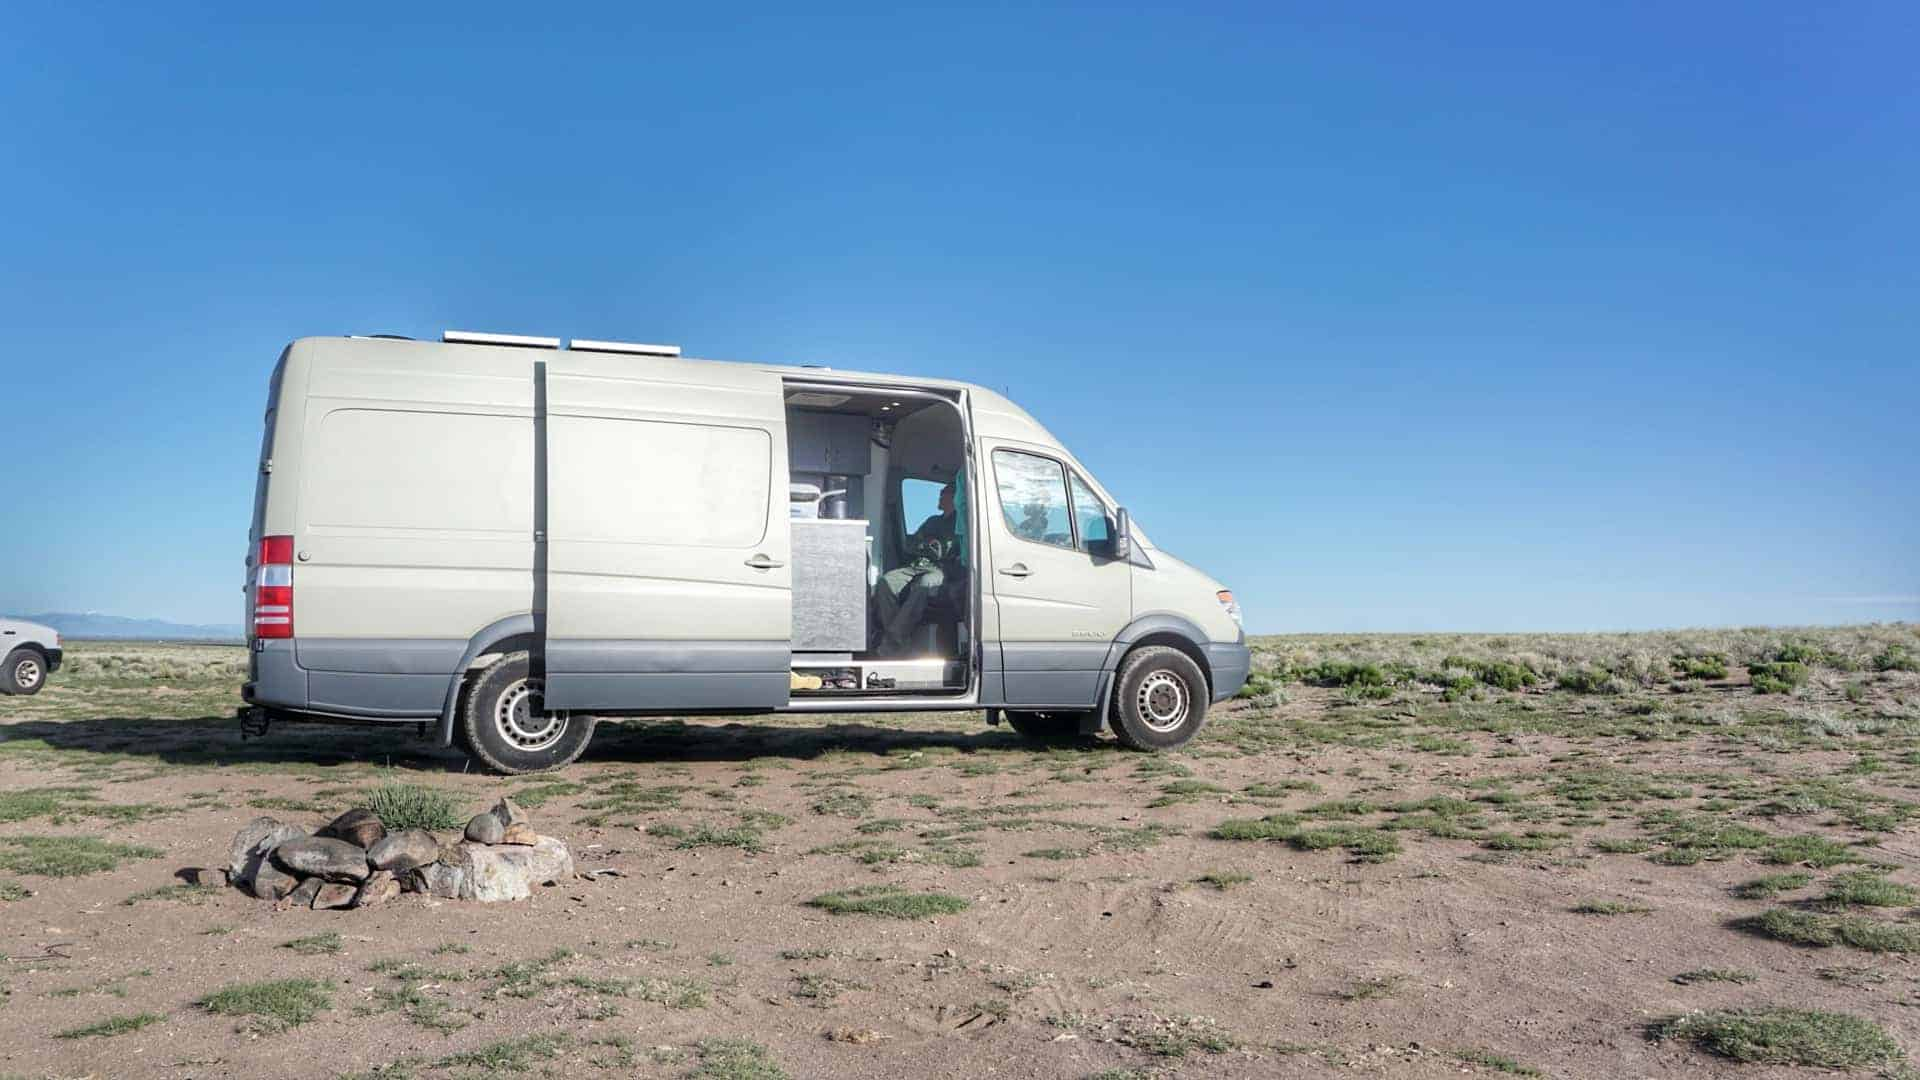 Boondocking Great Sand Dunes National Park 4